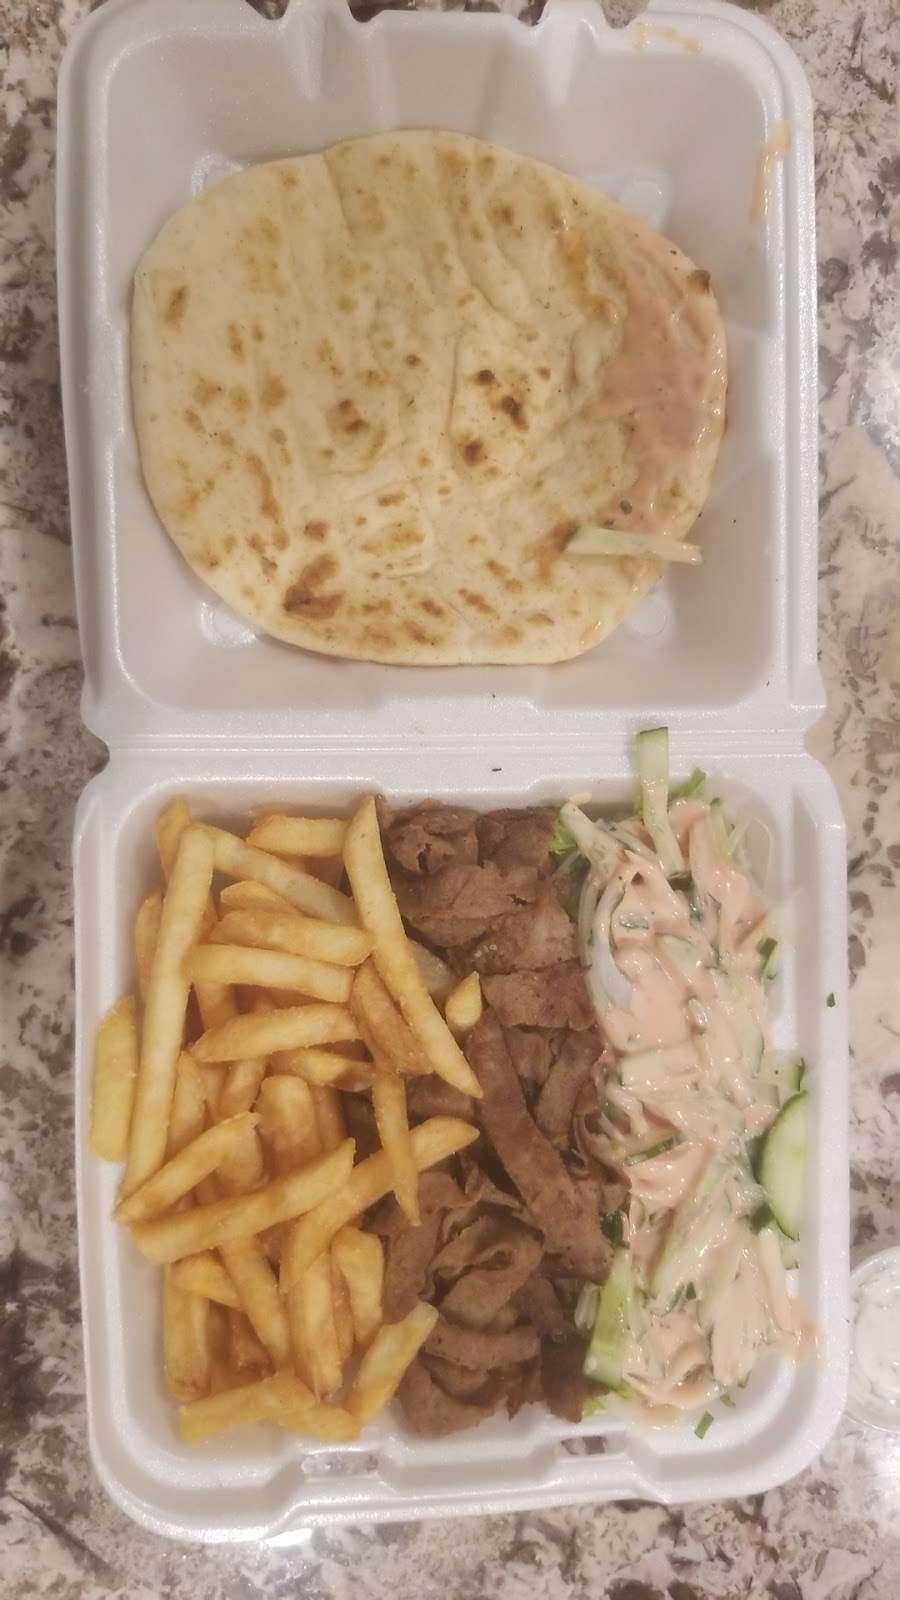 SMYRNA GYRO & GRILL - restaurant  | Photo 7 of 10 | Address: 133 Main Ave, Wallington, NJ 07057, USA